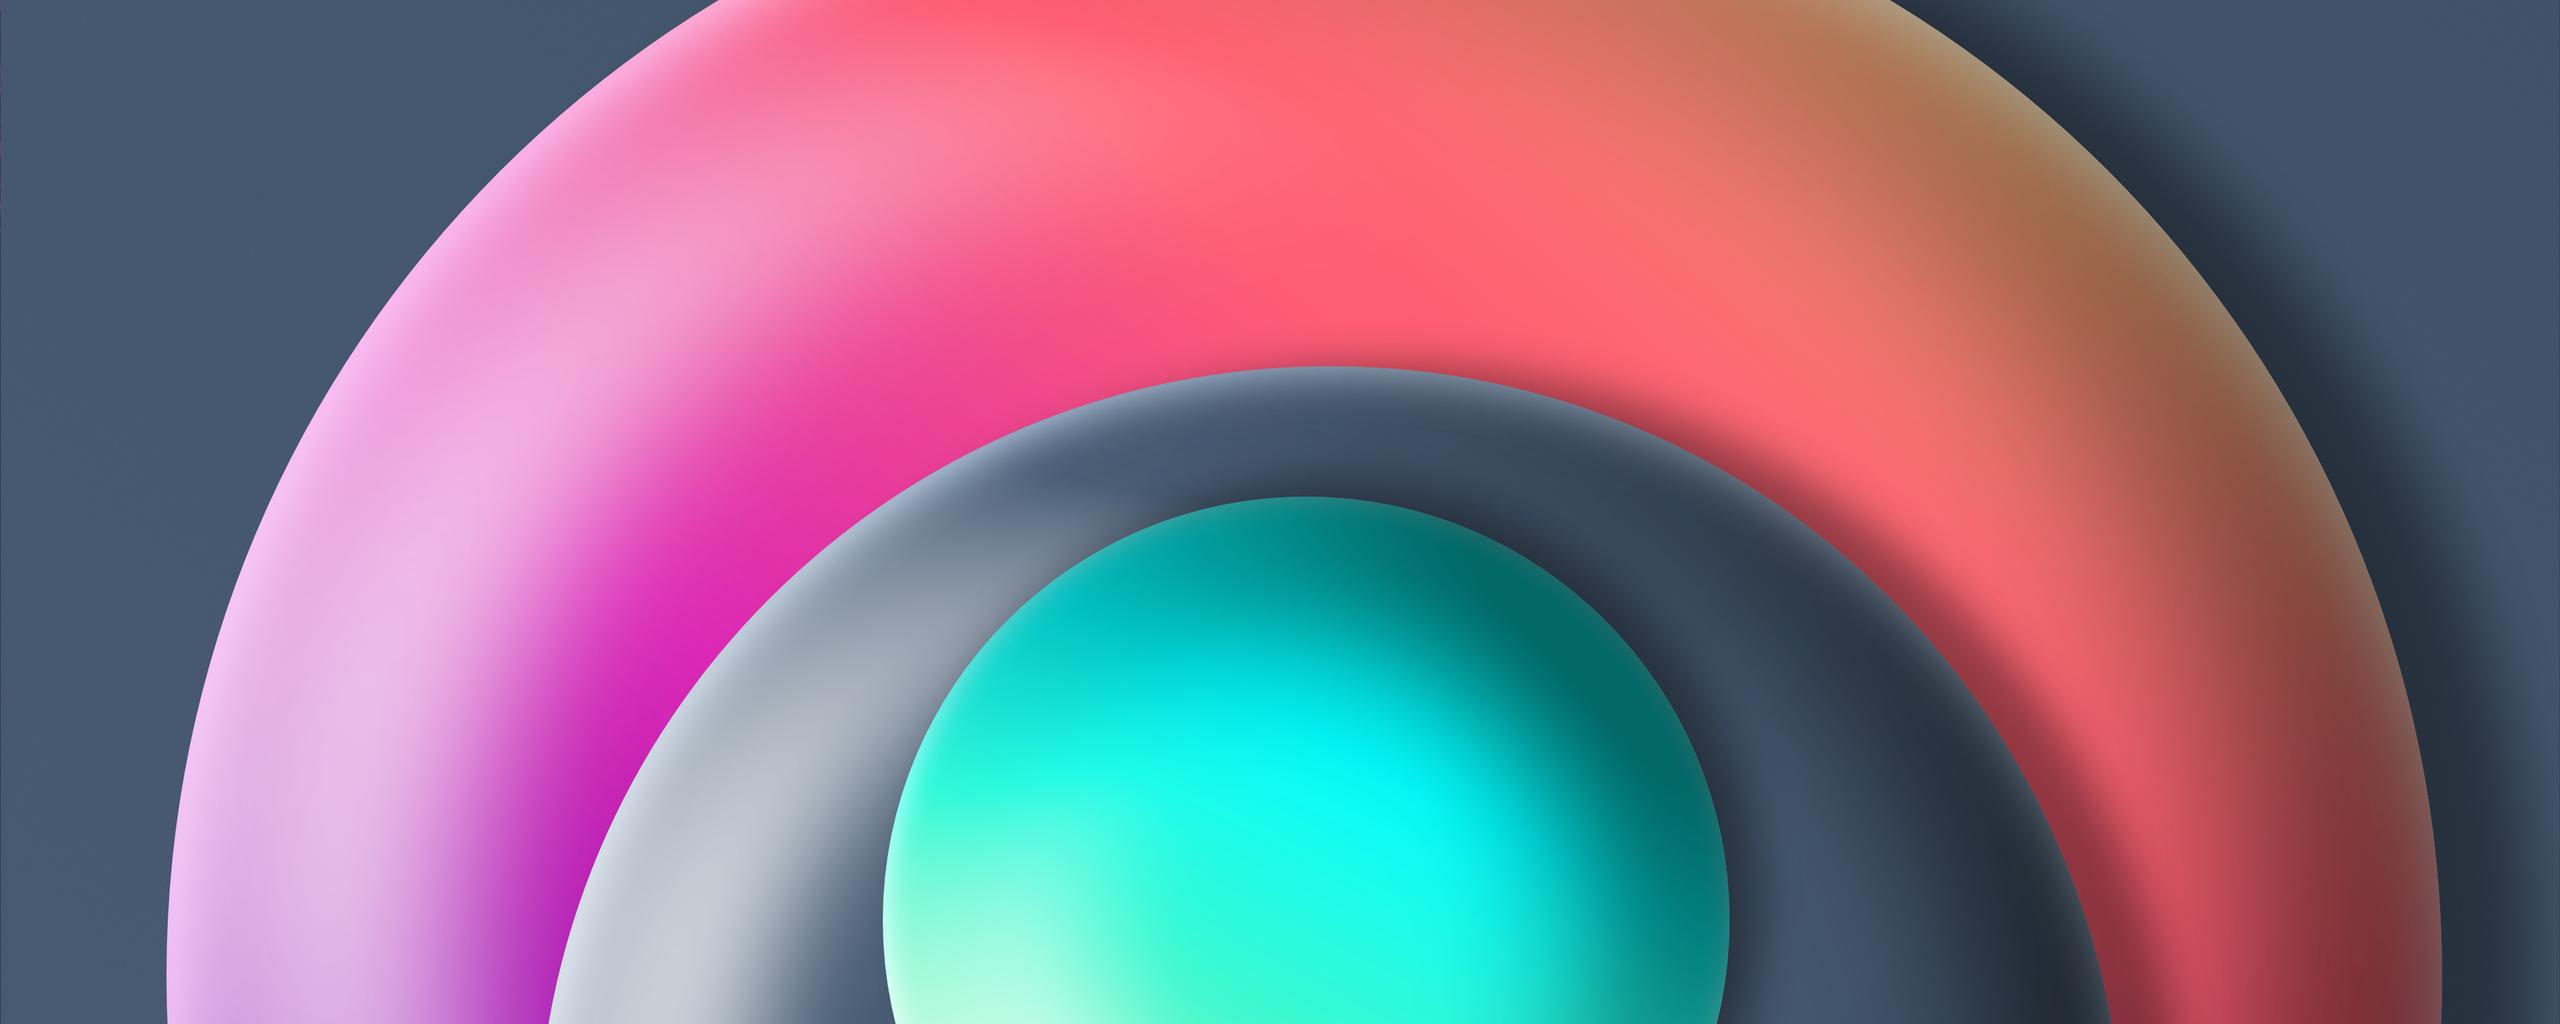 ball-abstract-3d-8k-tf.jpg